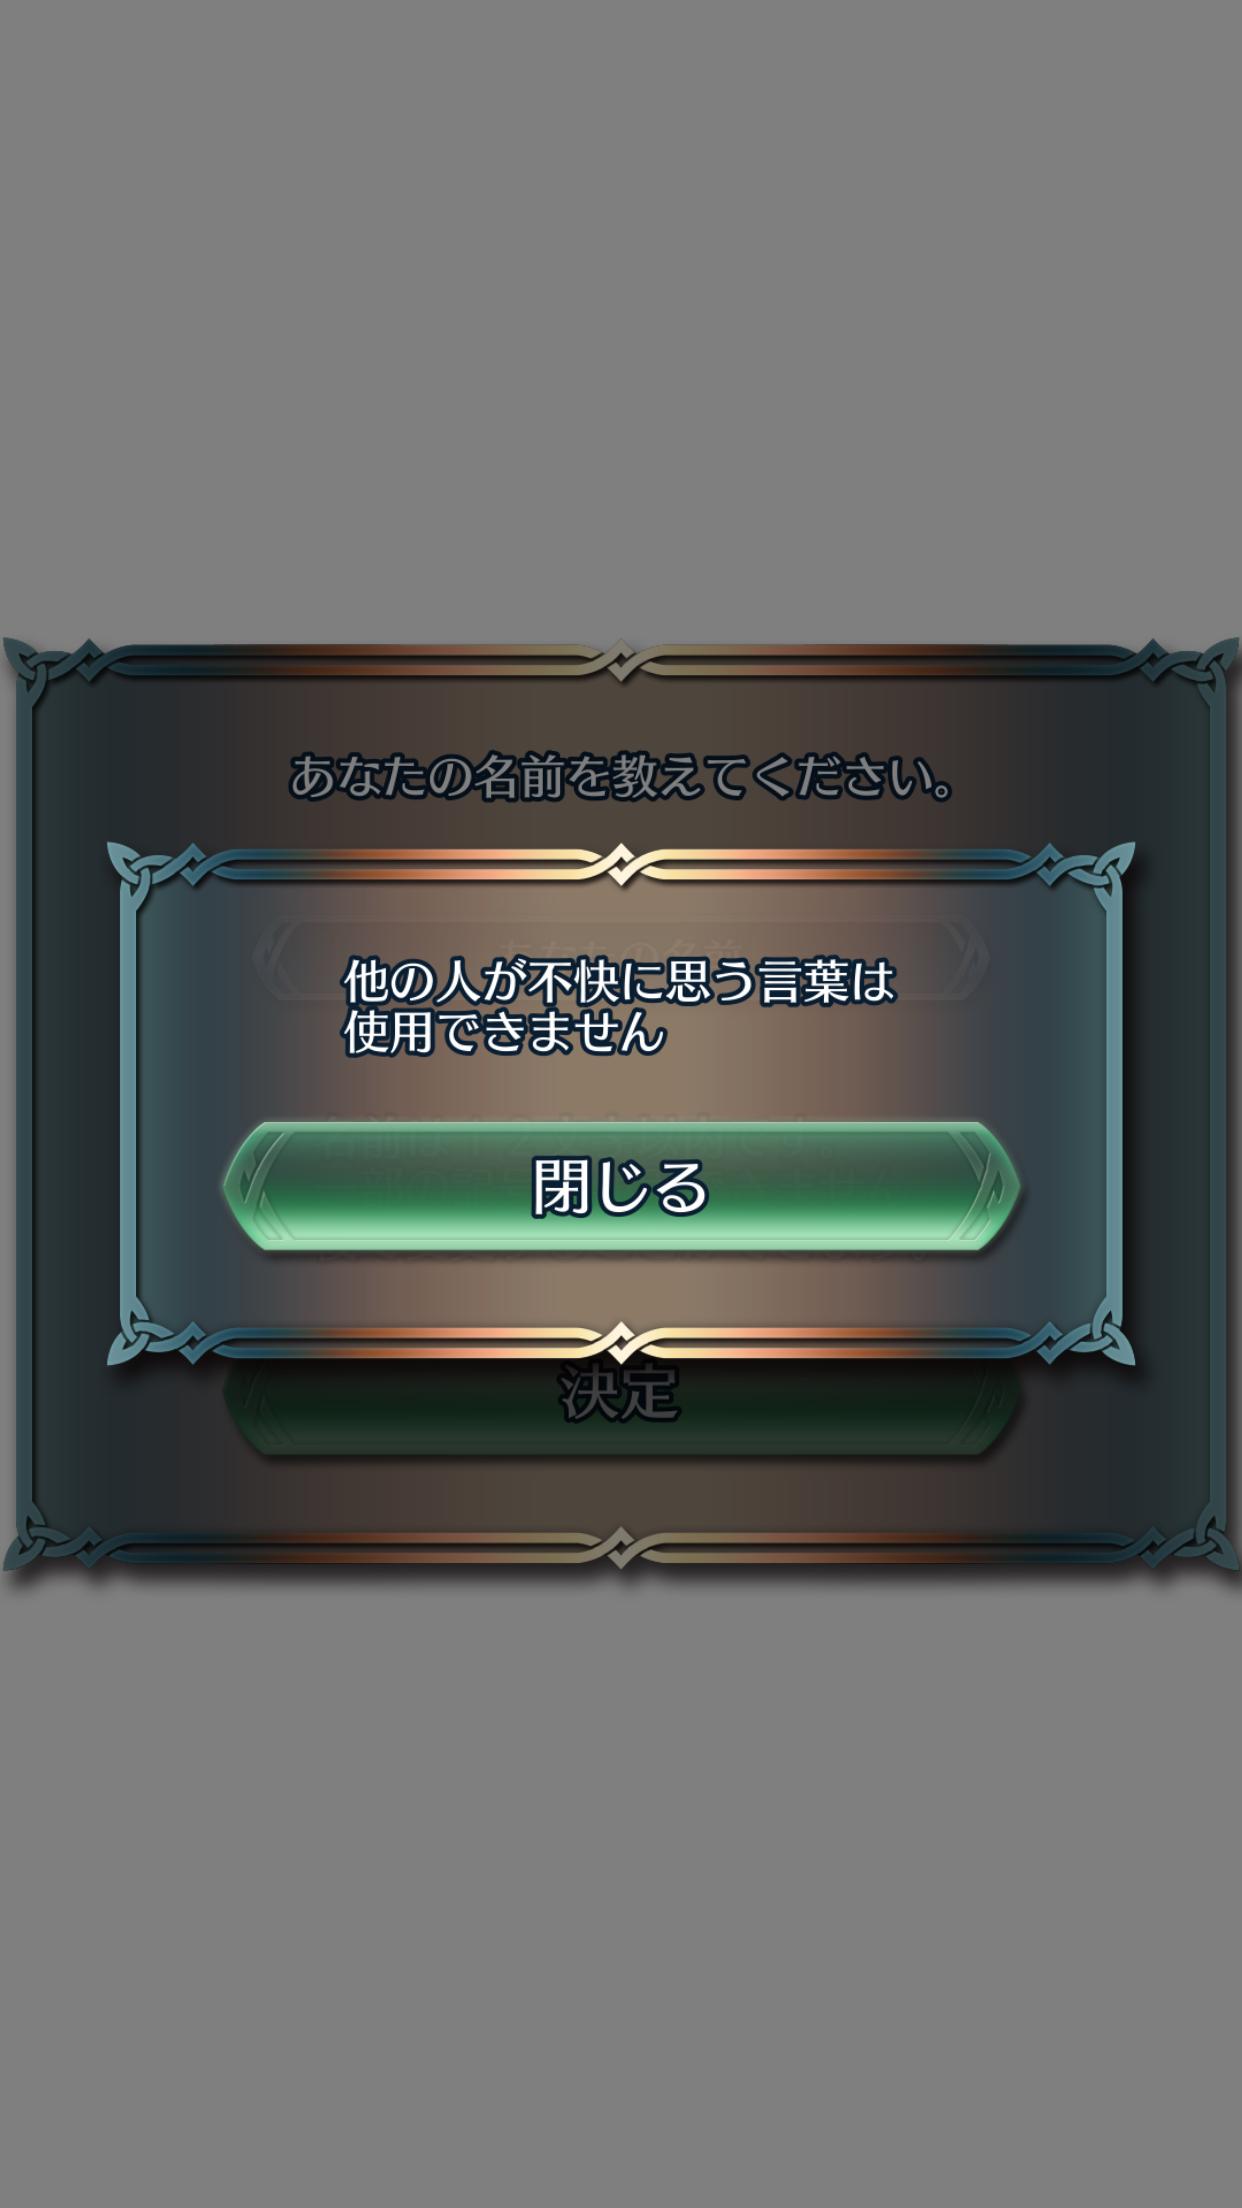 XrP4hUP.jpg